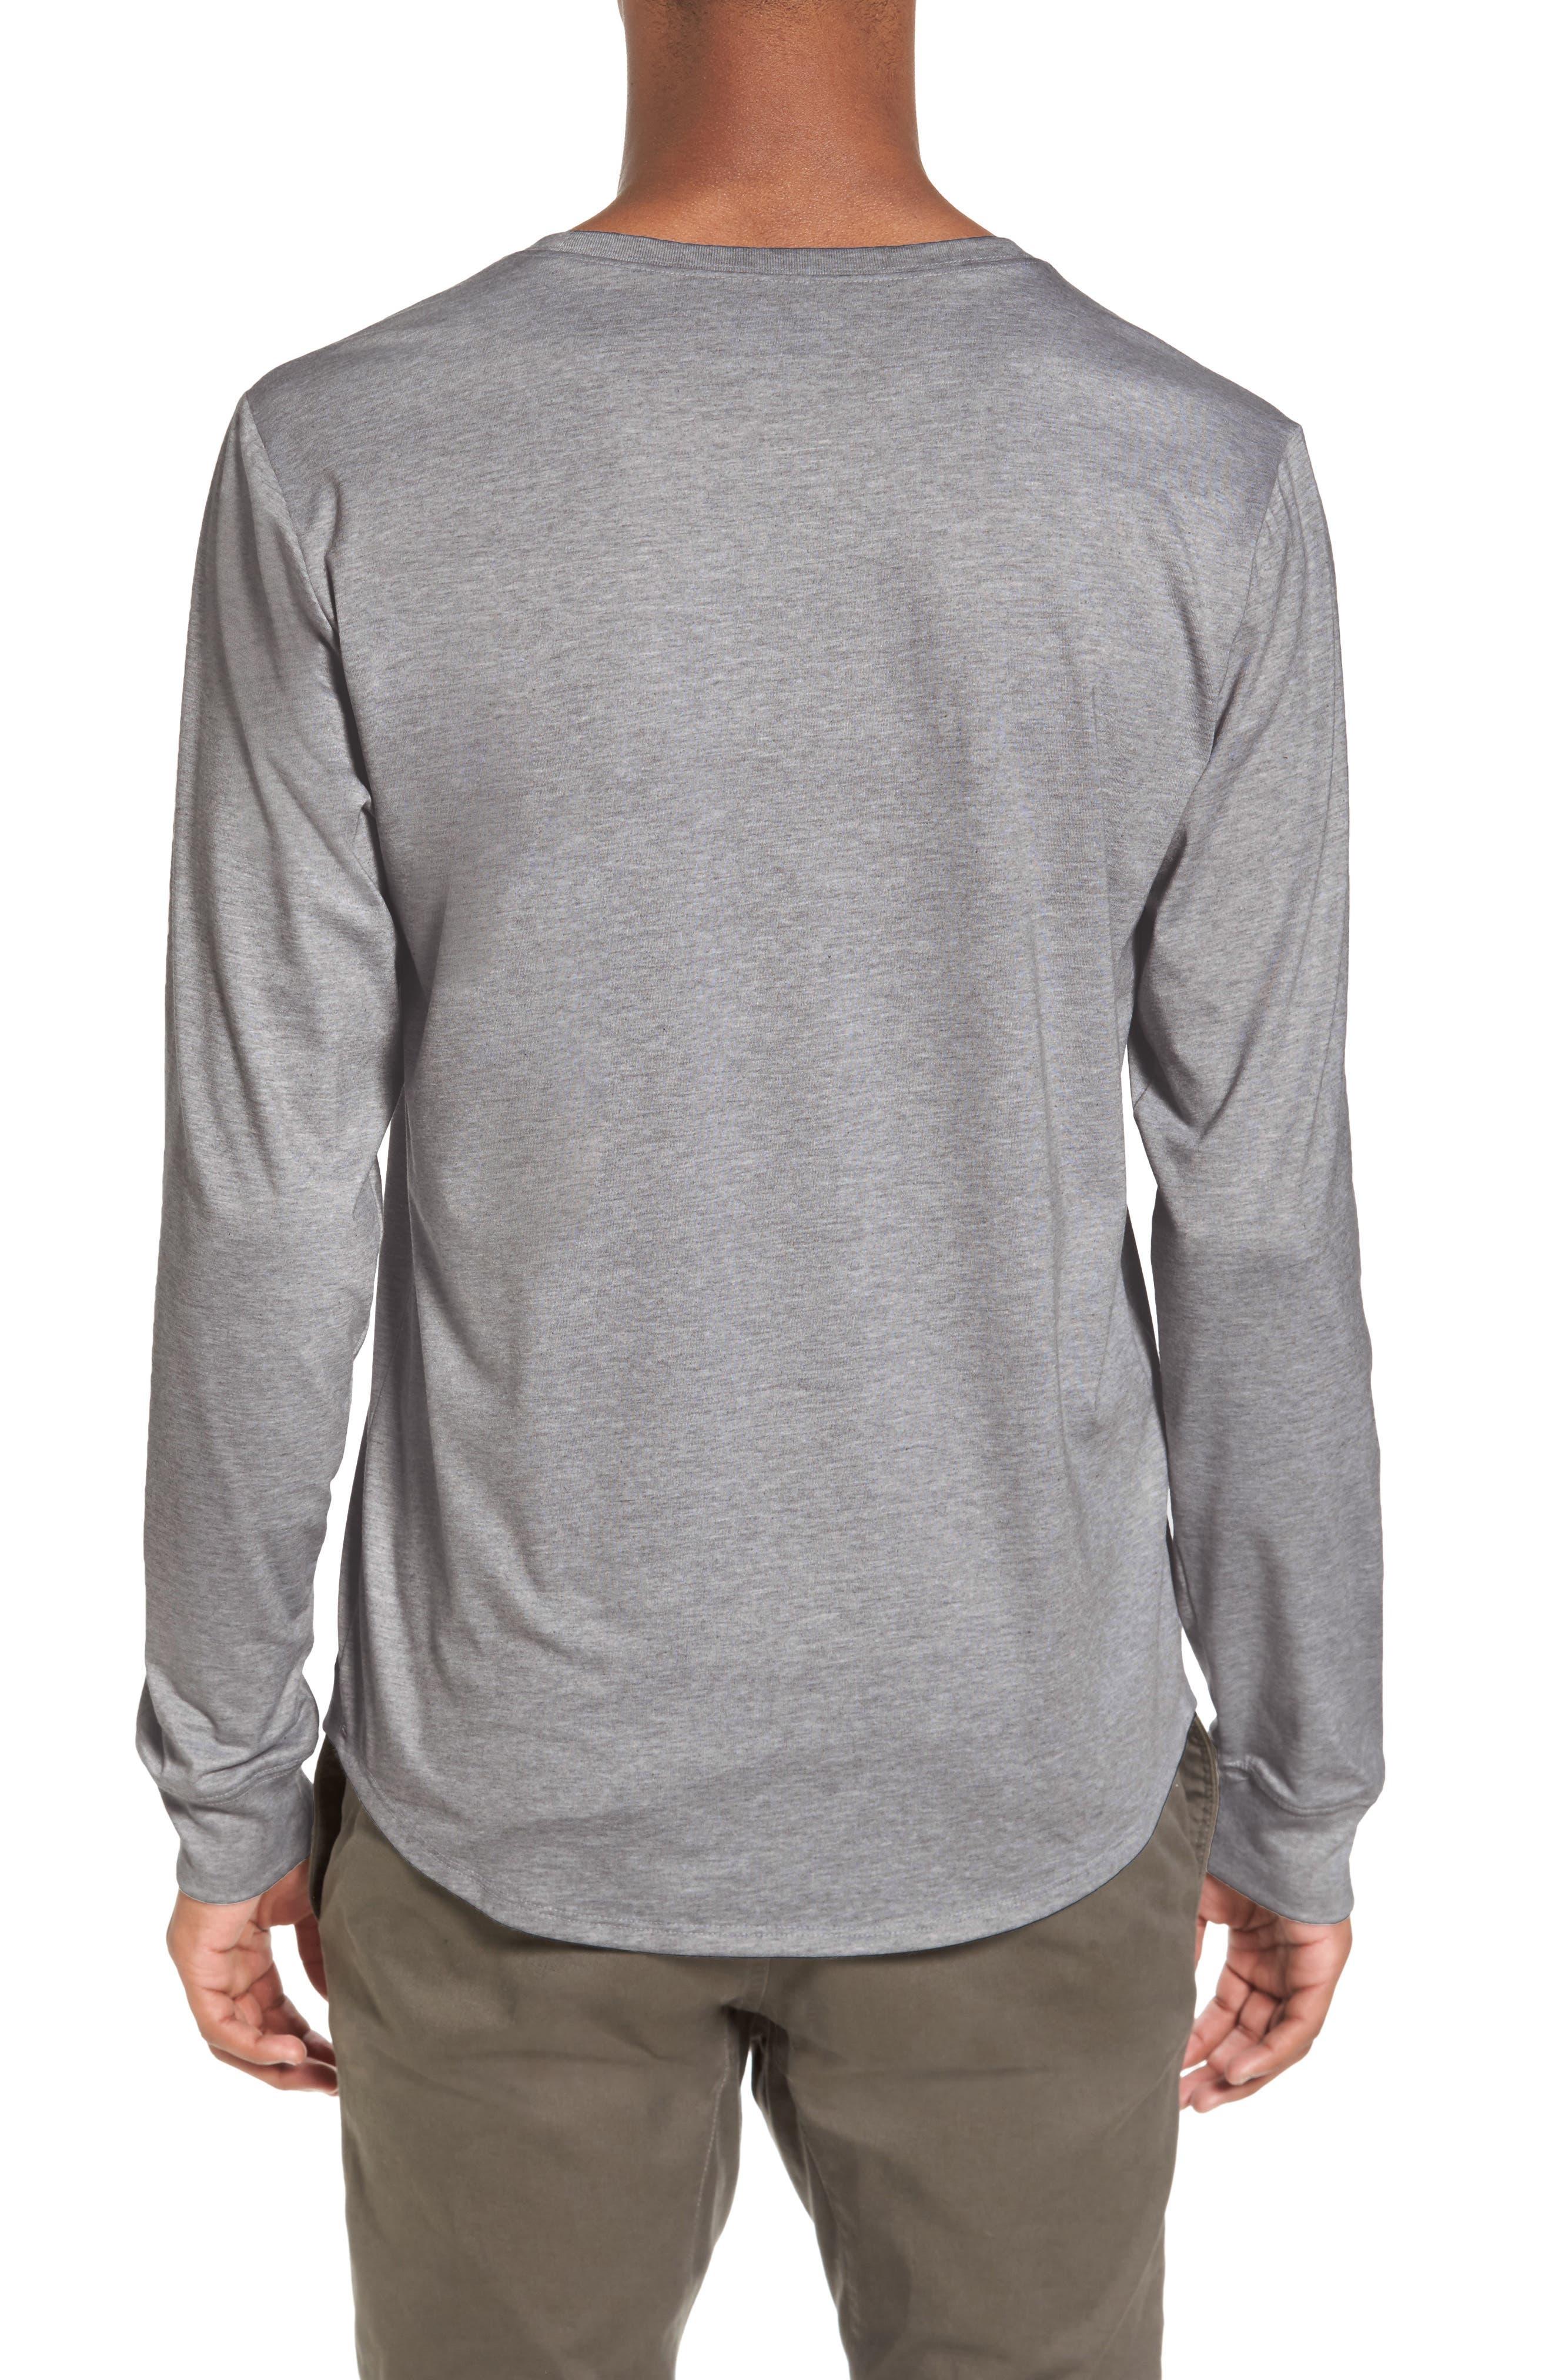 Yantra Long Sleeve T-Shirt,                             Alternate thumbnail 6, color,                             Heather Grey/ Heather Grey